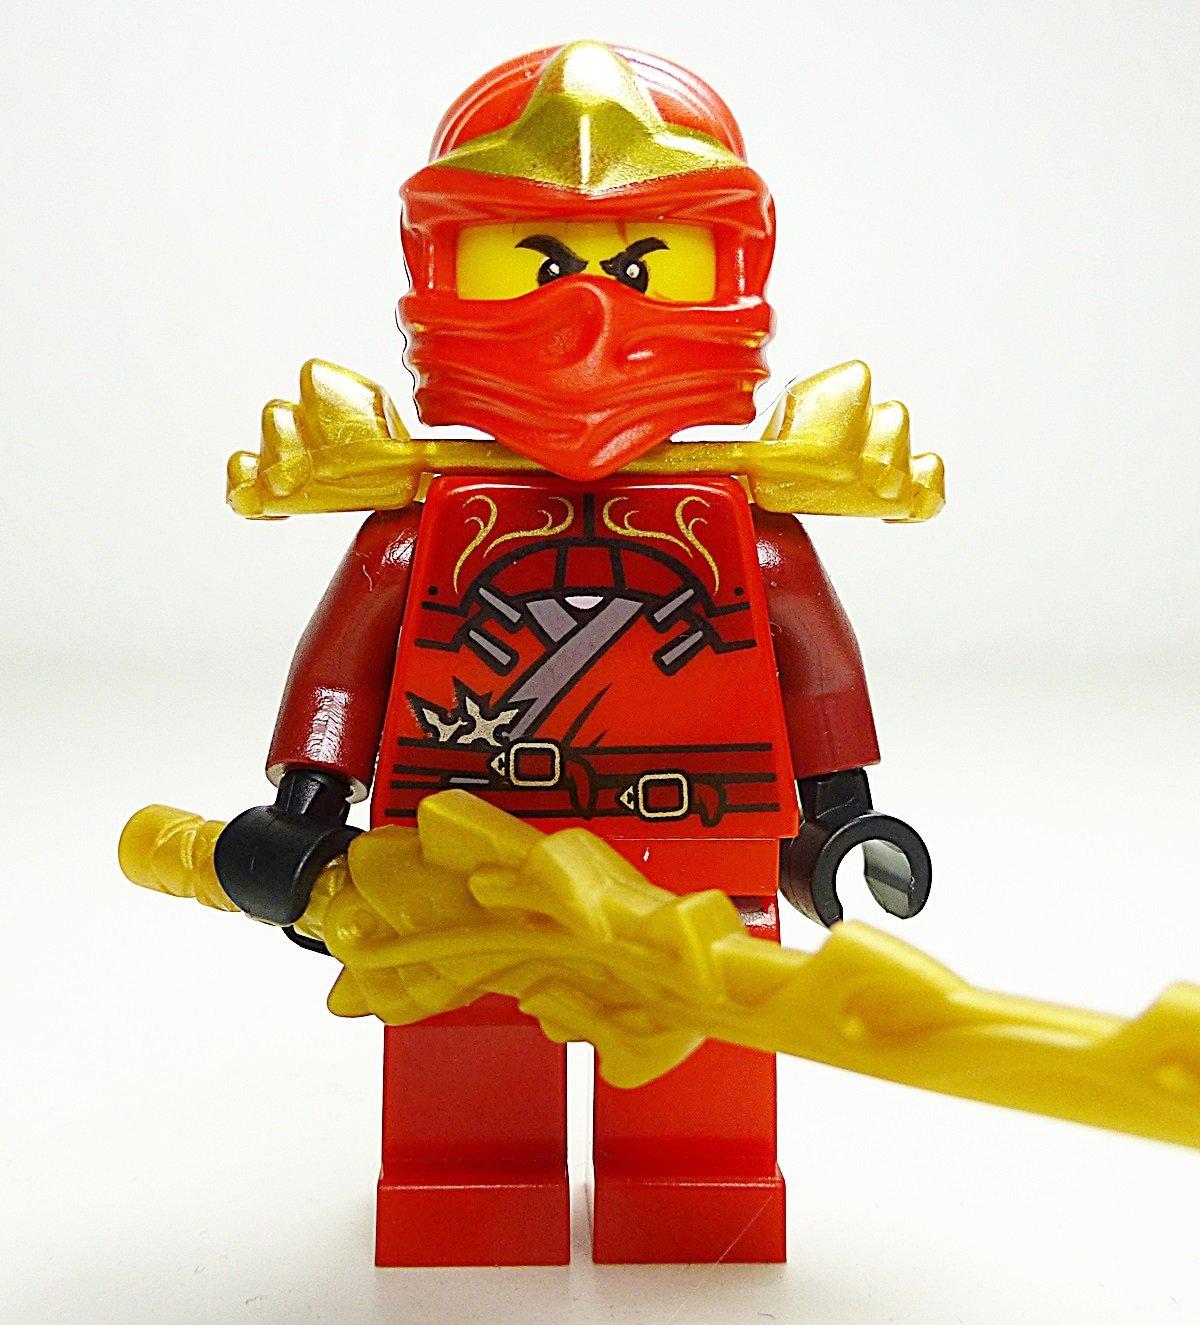 Lego ninjago kai zx with armor and dragon sword ebay - Ninjago lego kai ...